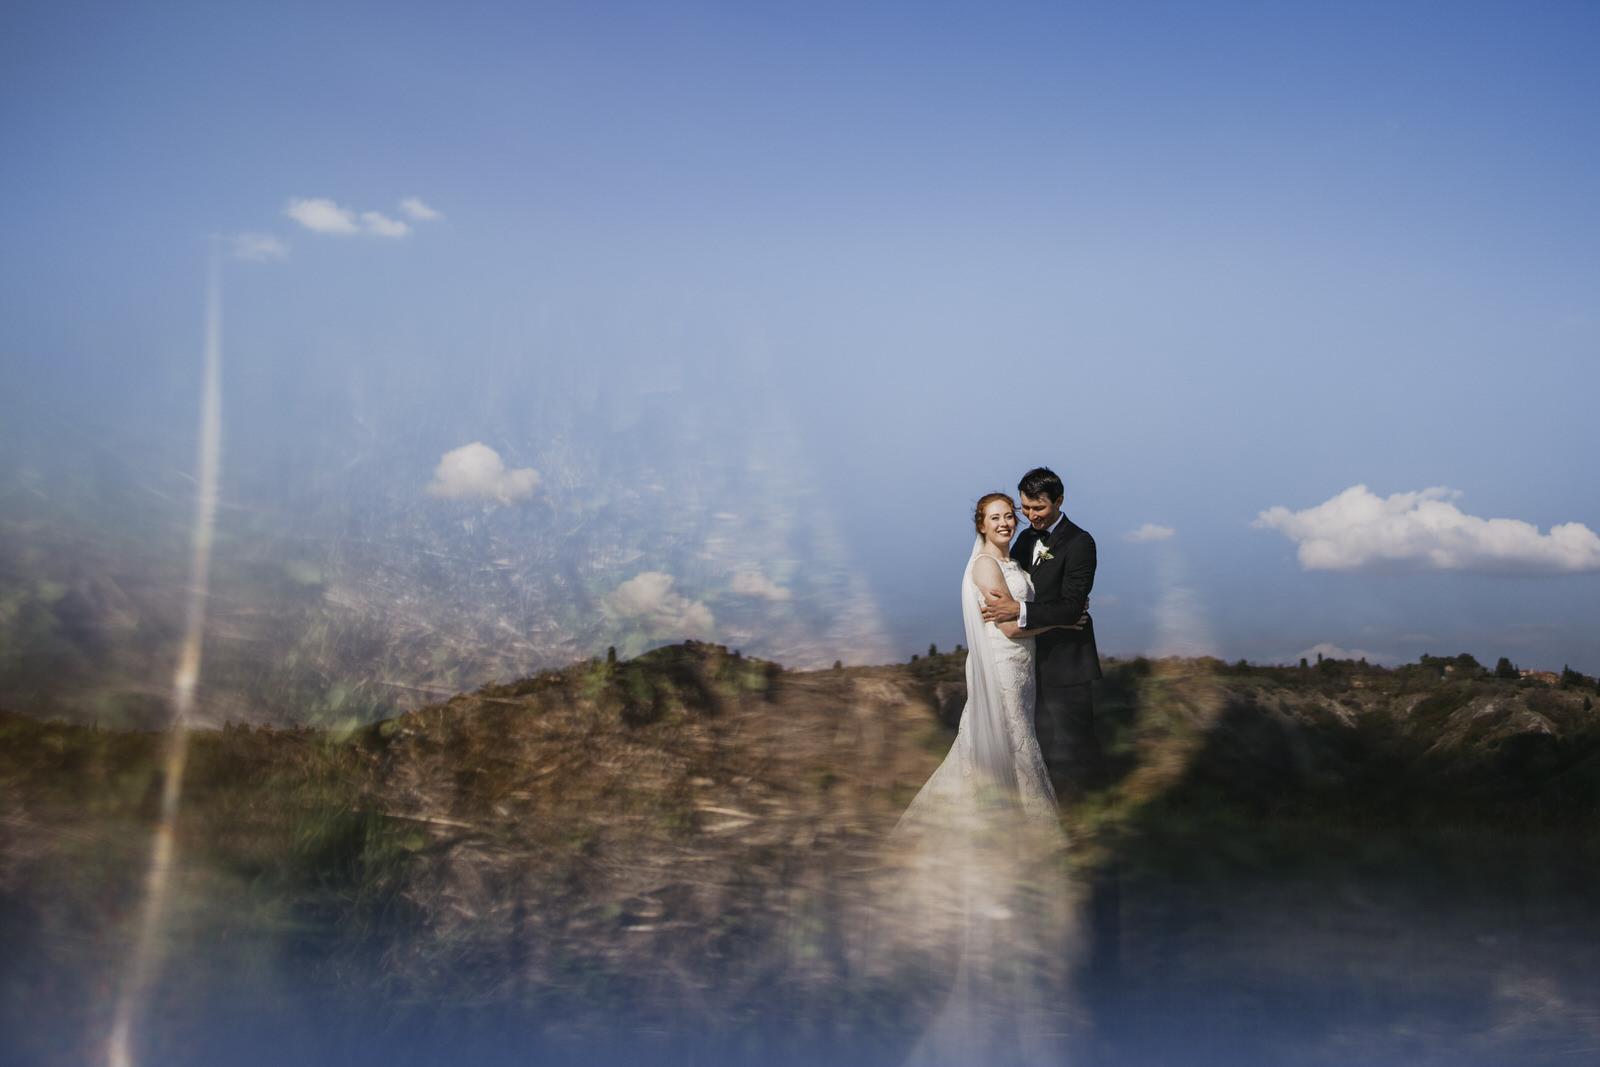 wedding photographer in italy-venice-tuscany-florence-amalfi coast-como lake-villa del balbianello-siena-amalfi-ravello-belmond-villa cimbrone54